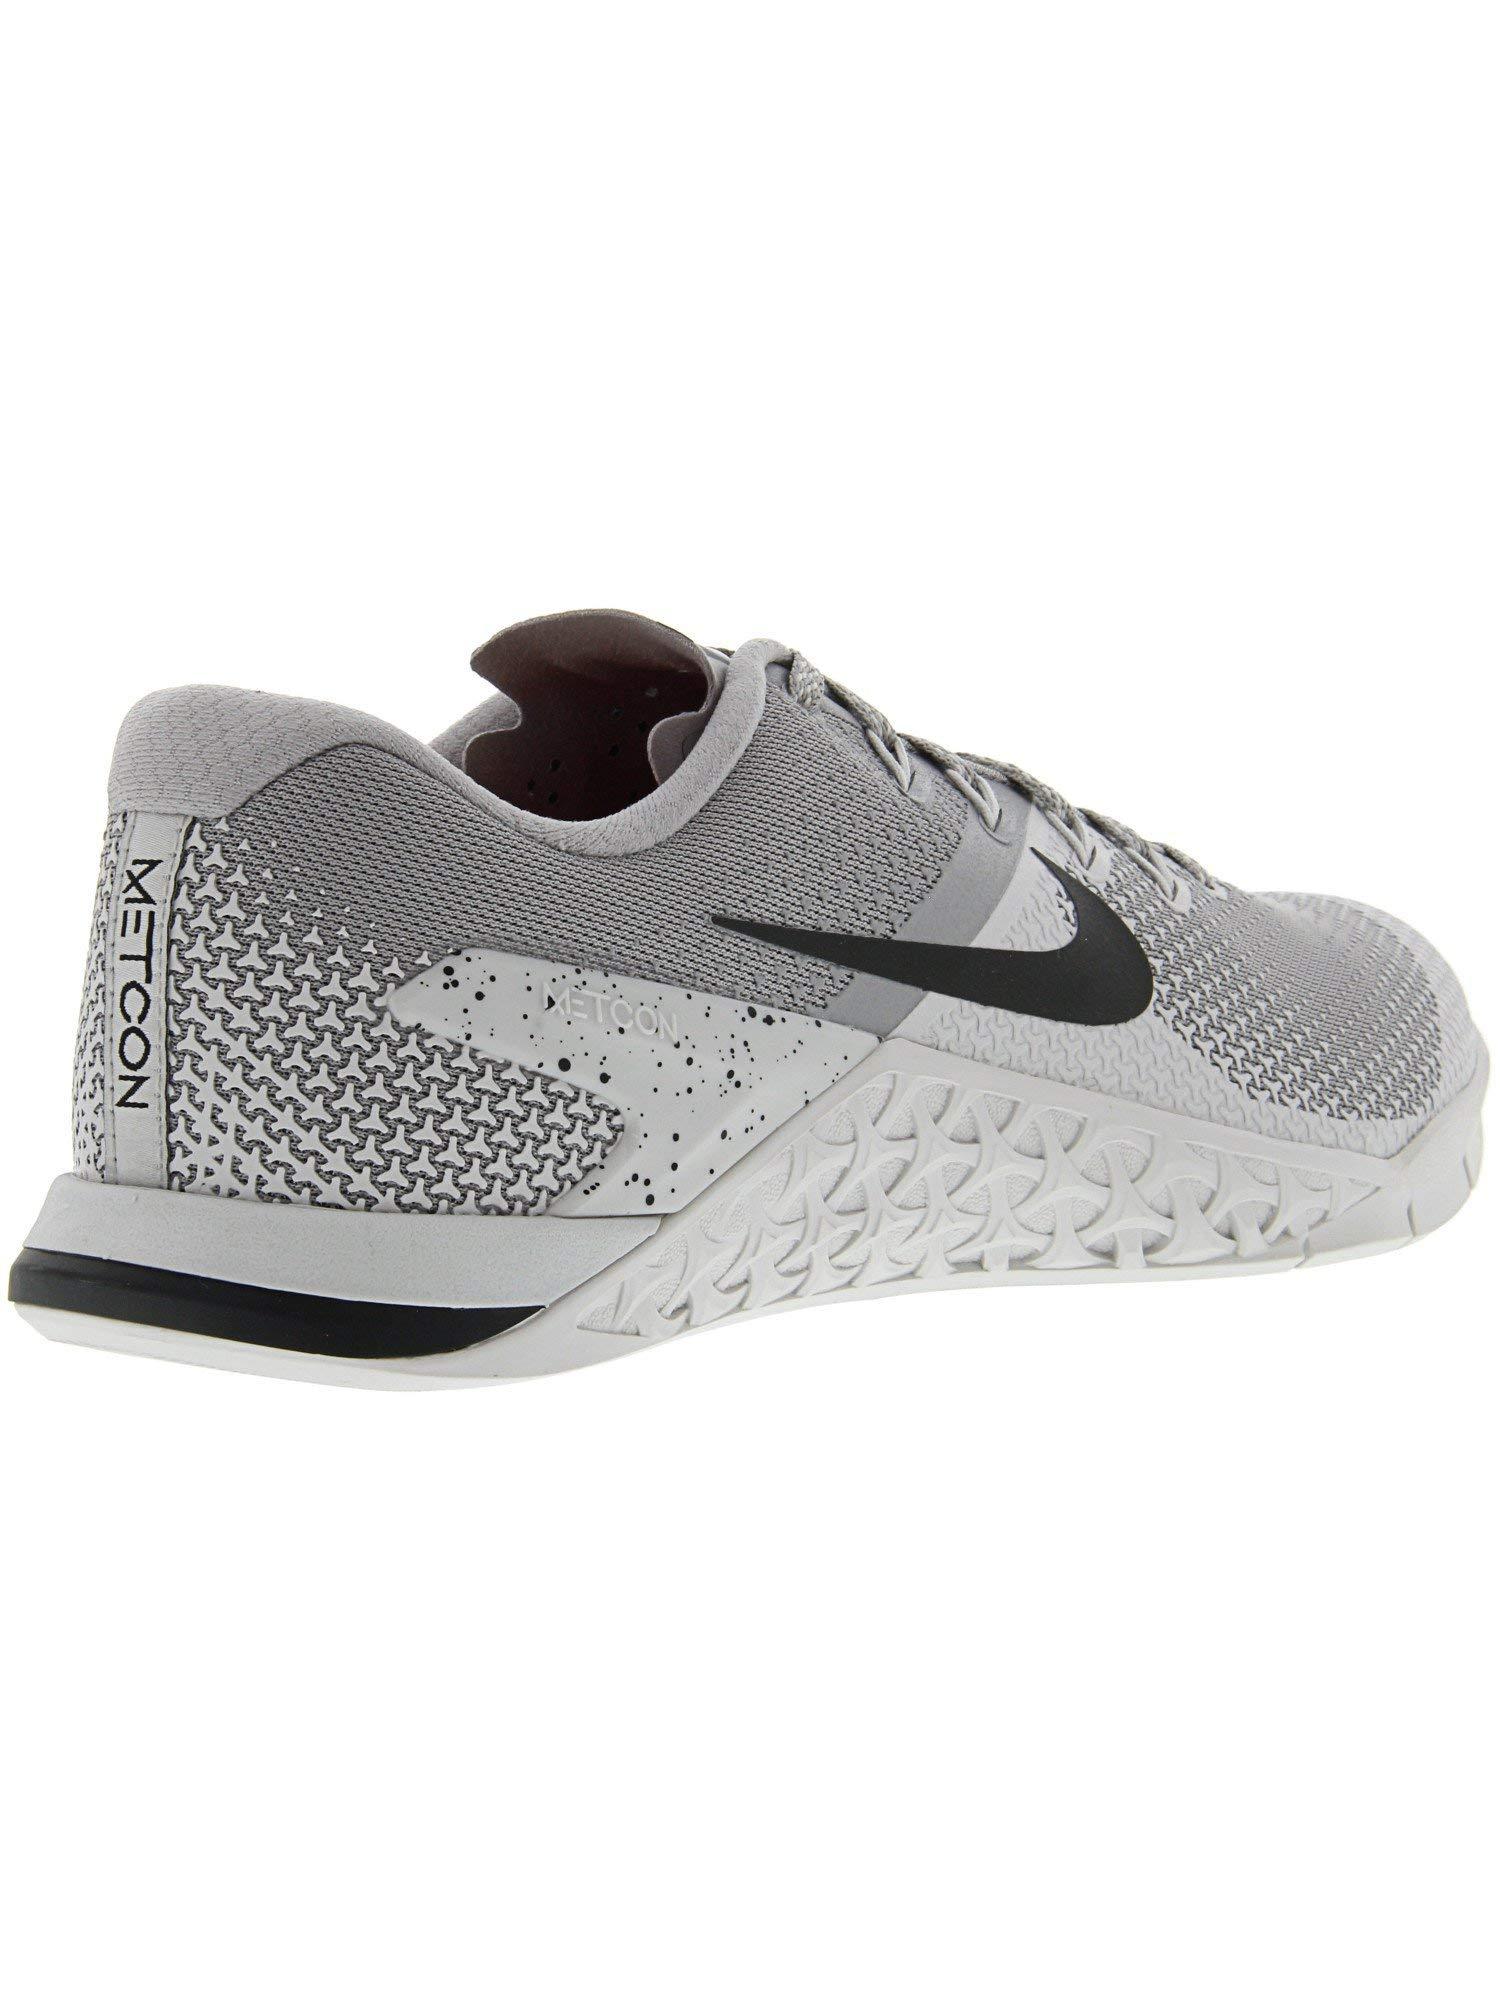 Nike Men's Metcon 4 Atmosphere Grey/Black Ankle-High Cross Trainer Shoe - 6.5M by Nike (Image #5)